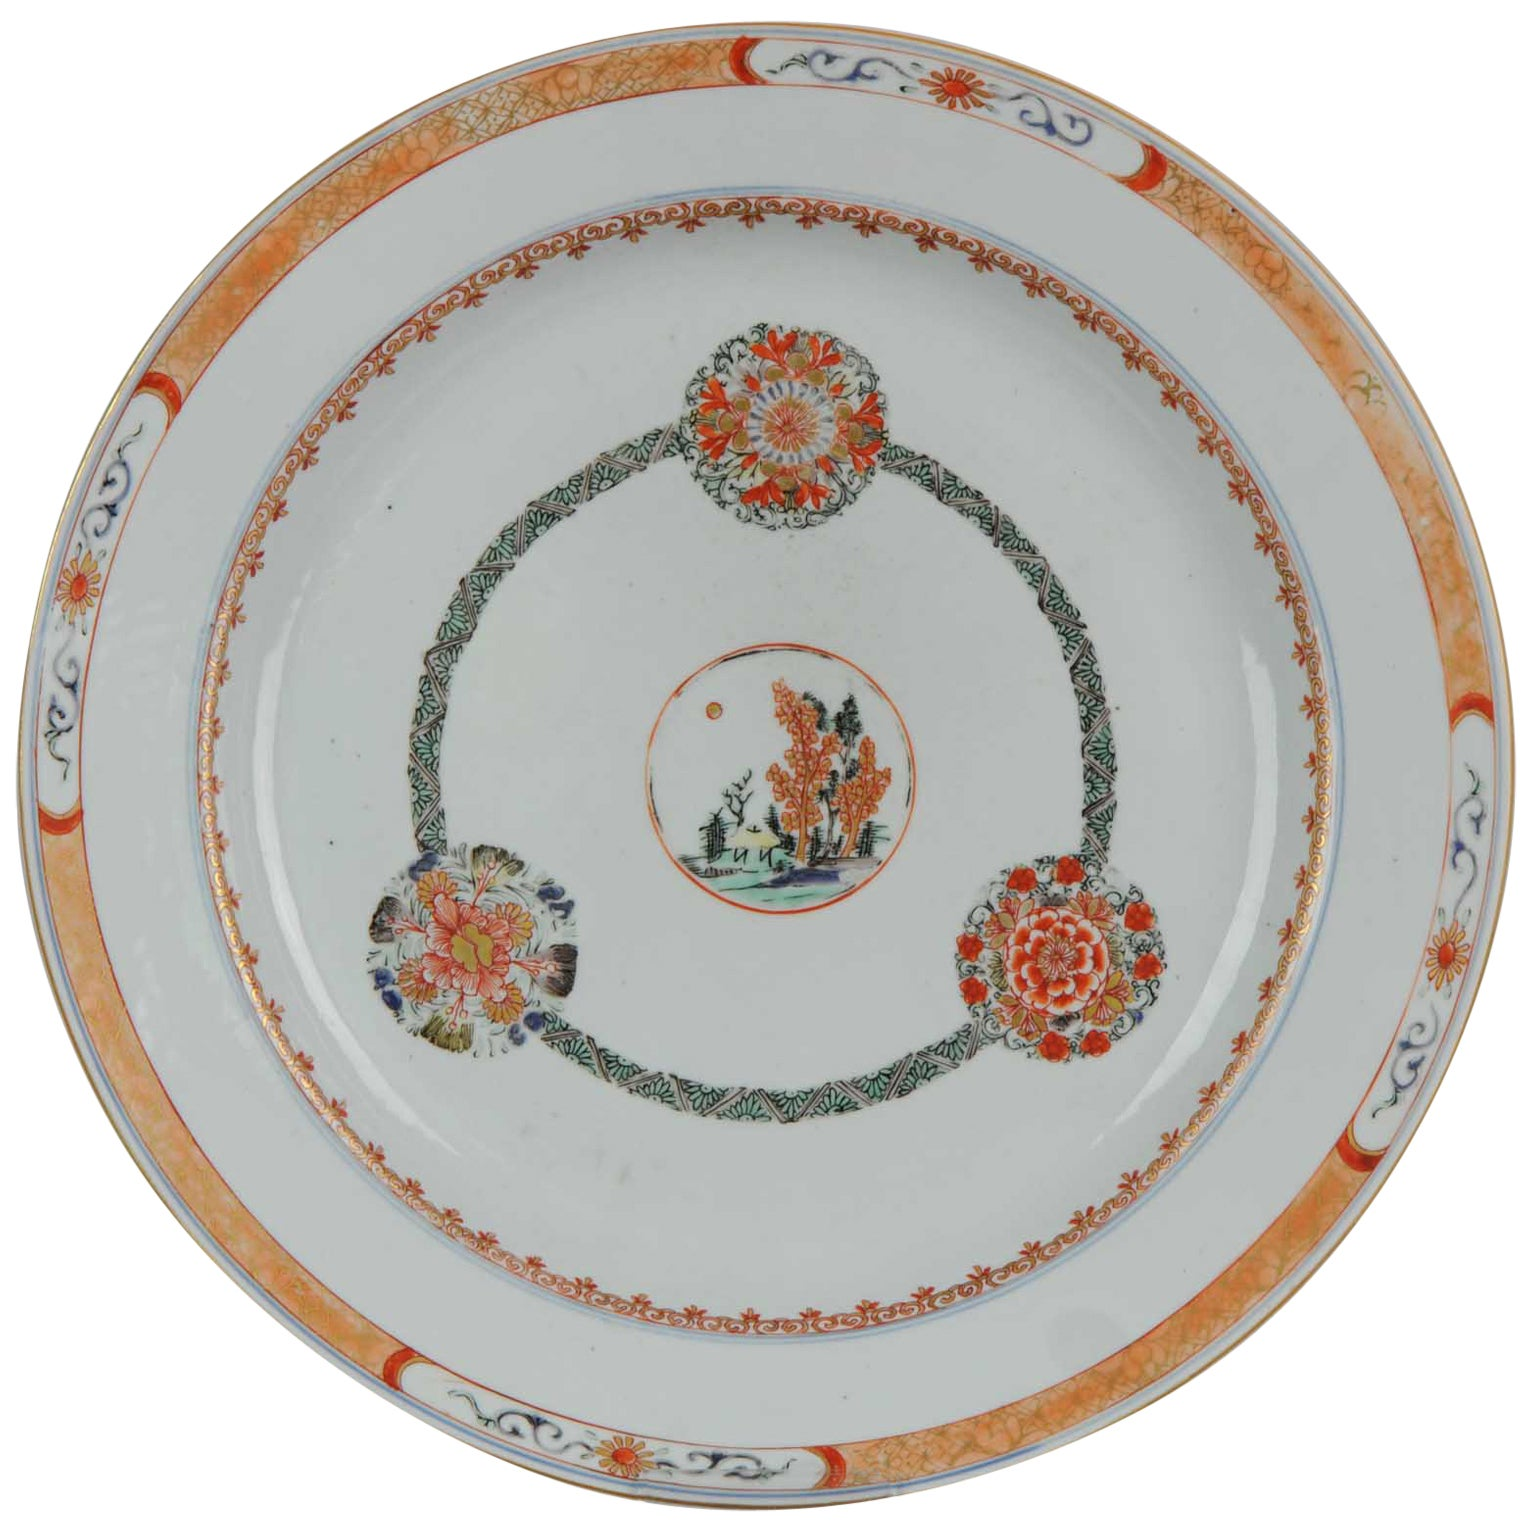 Antique circa 1700 Kangxi Famille Verte Chinese Porcelain Charger Land